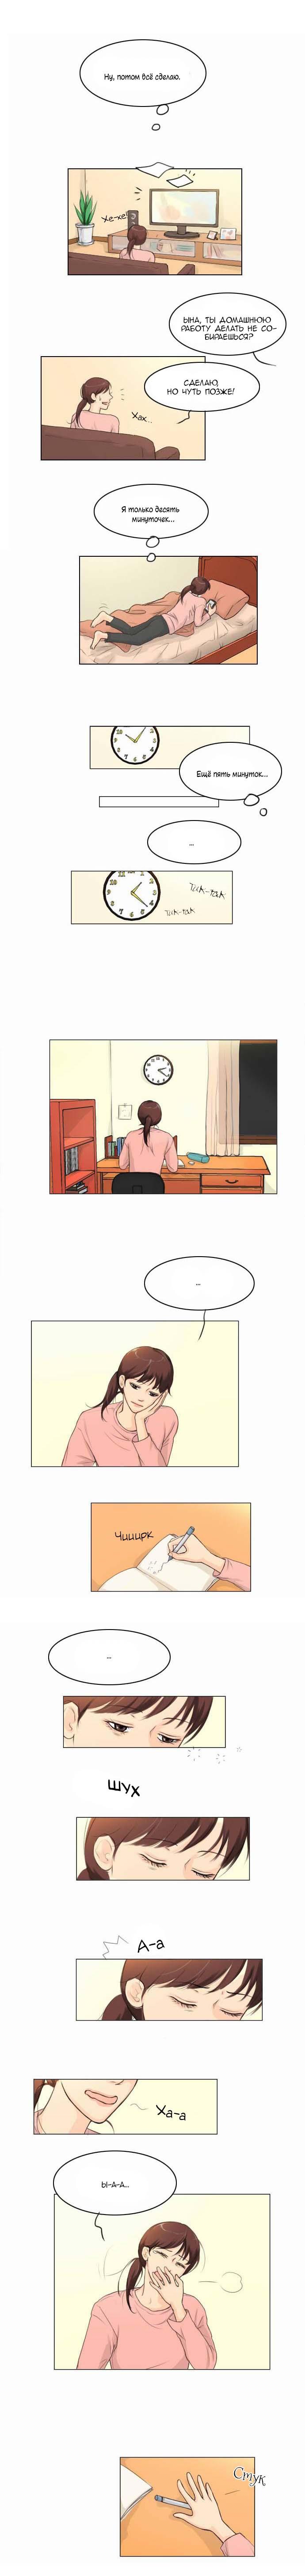 https://r1.ninemanga.com/comics/pic2/8/31048/304468/1467014767835.jpg Page 2